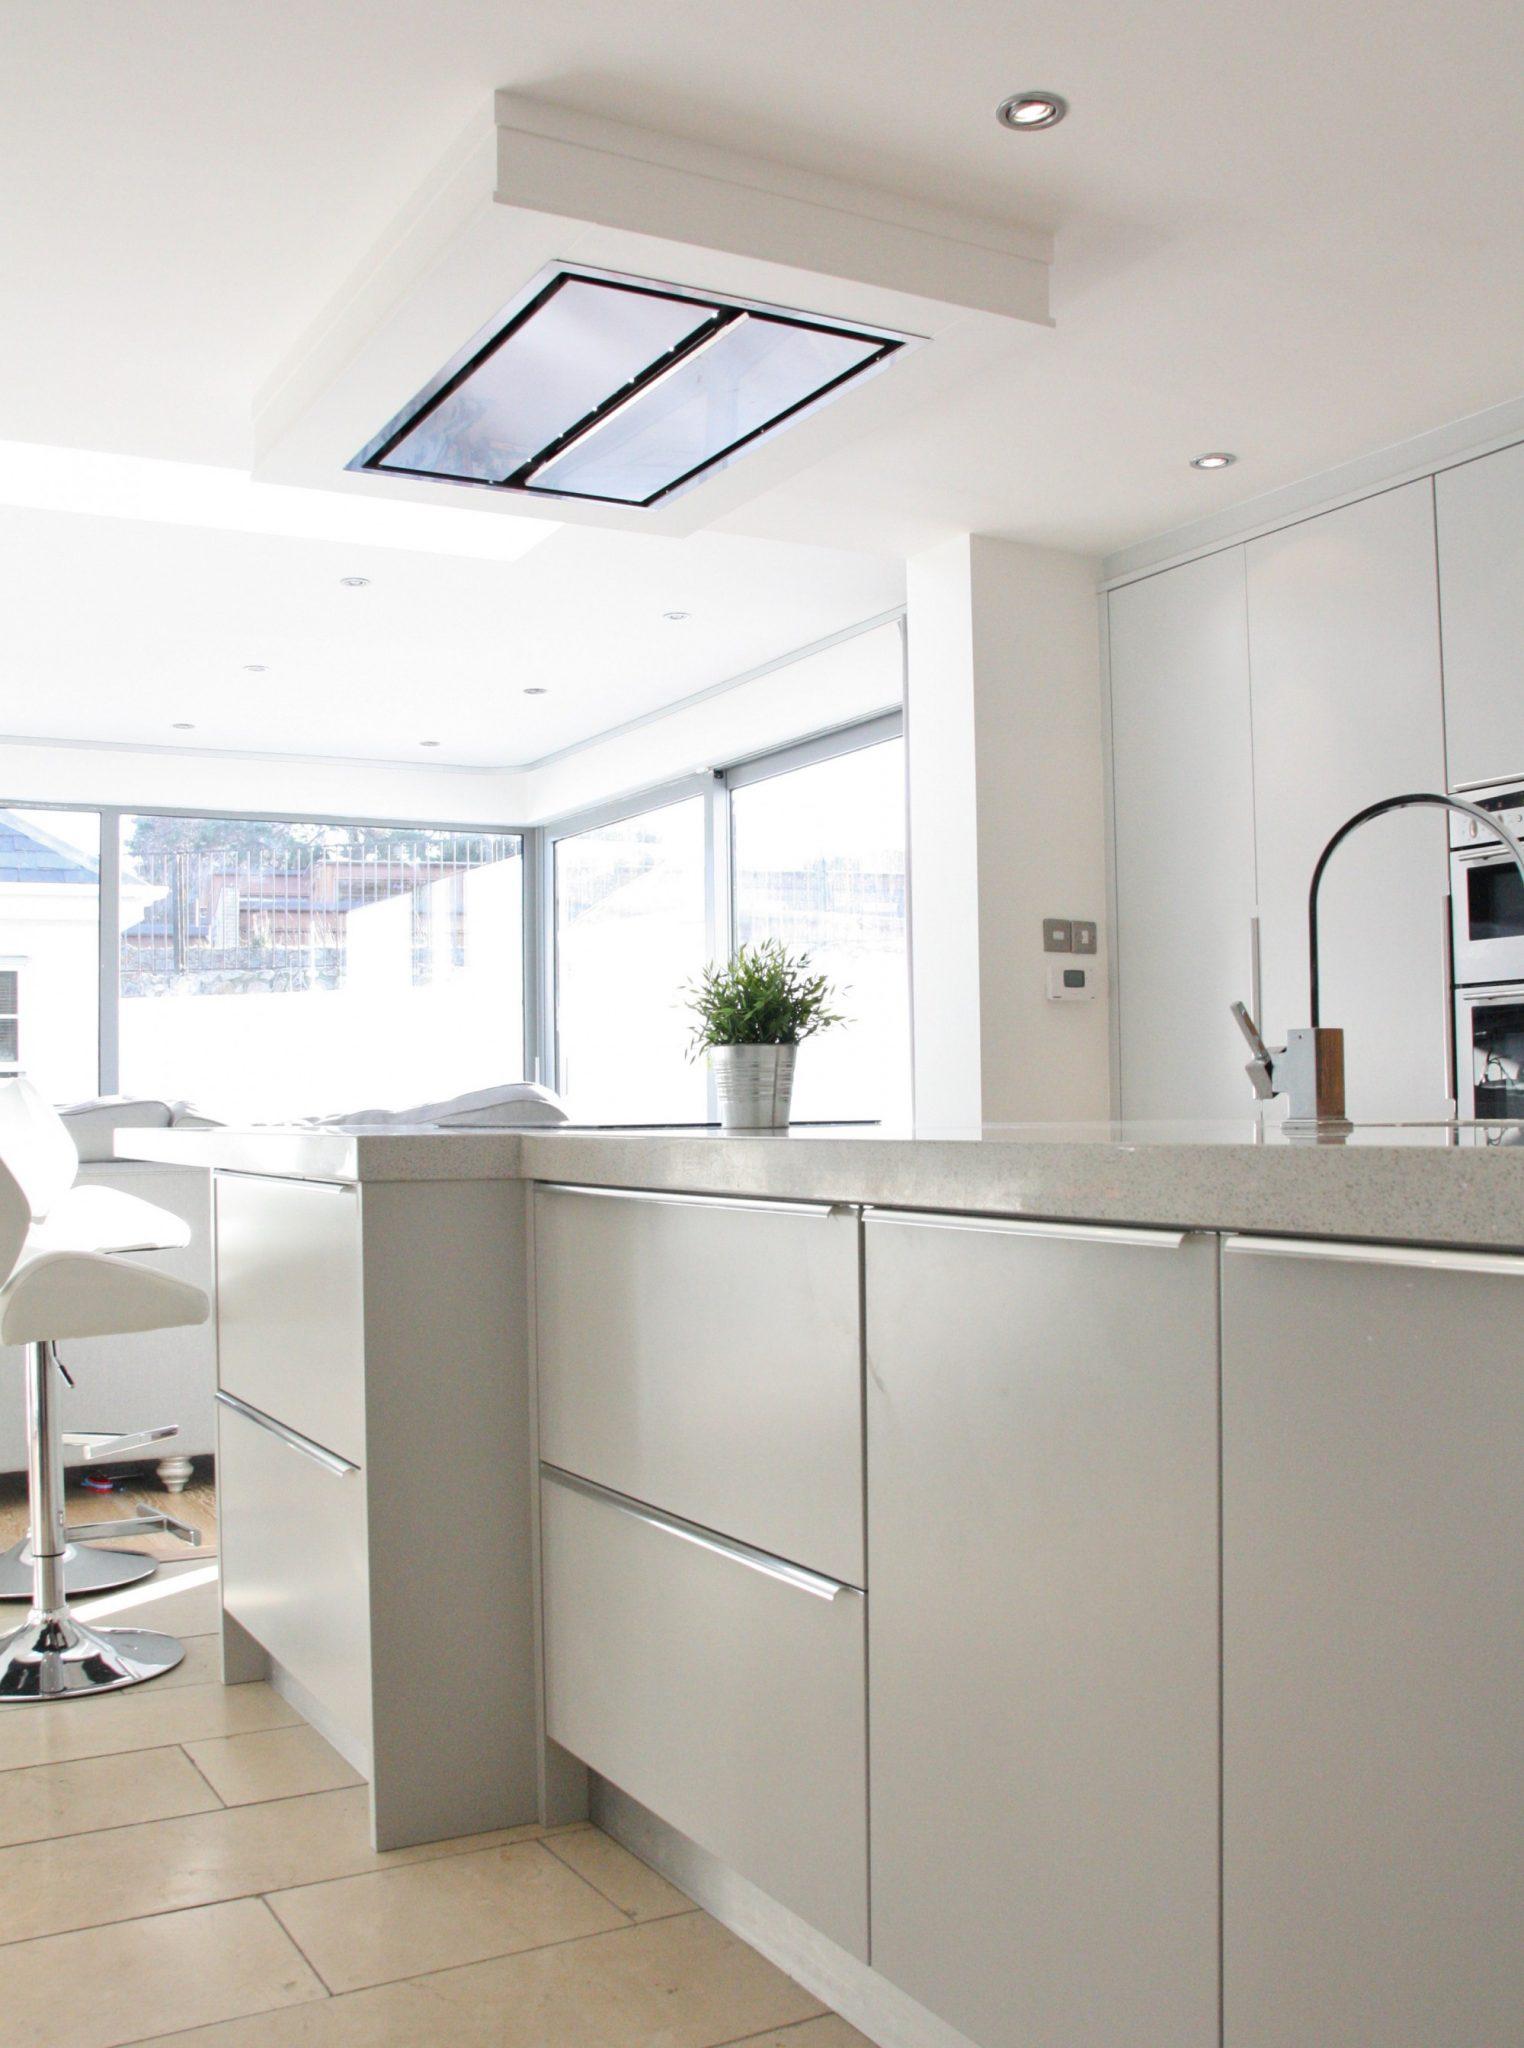 enigma design » contemporary flat panel kitchen design 4